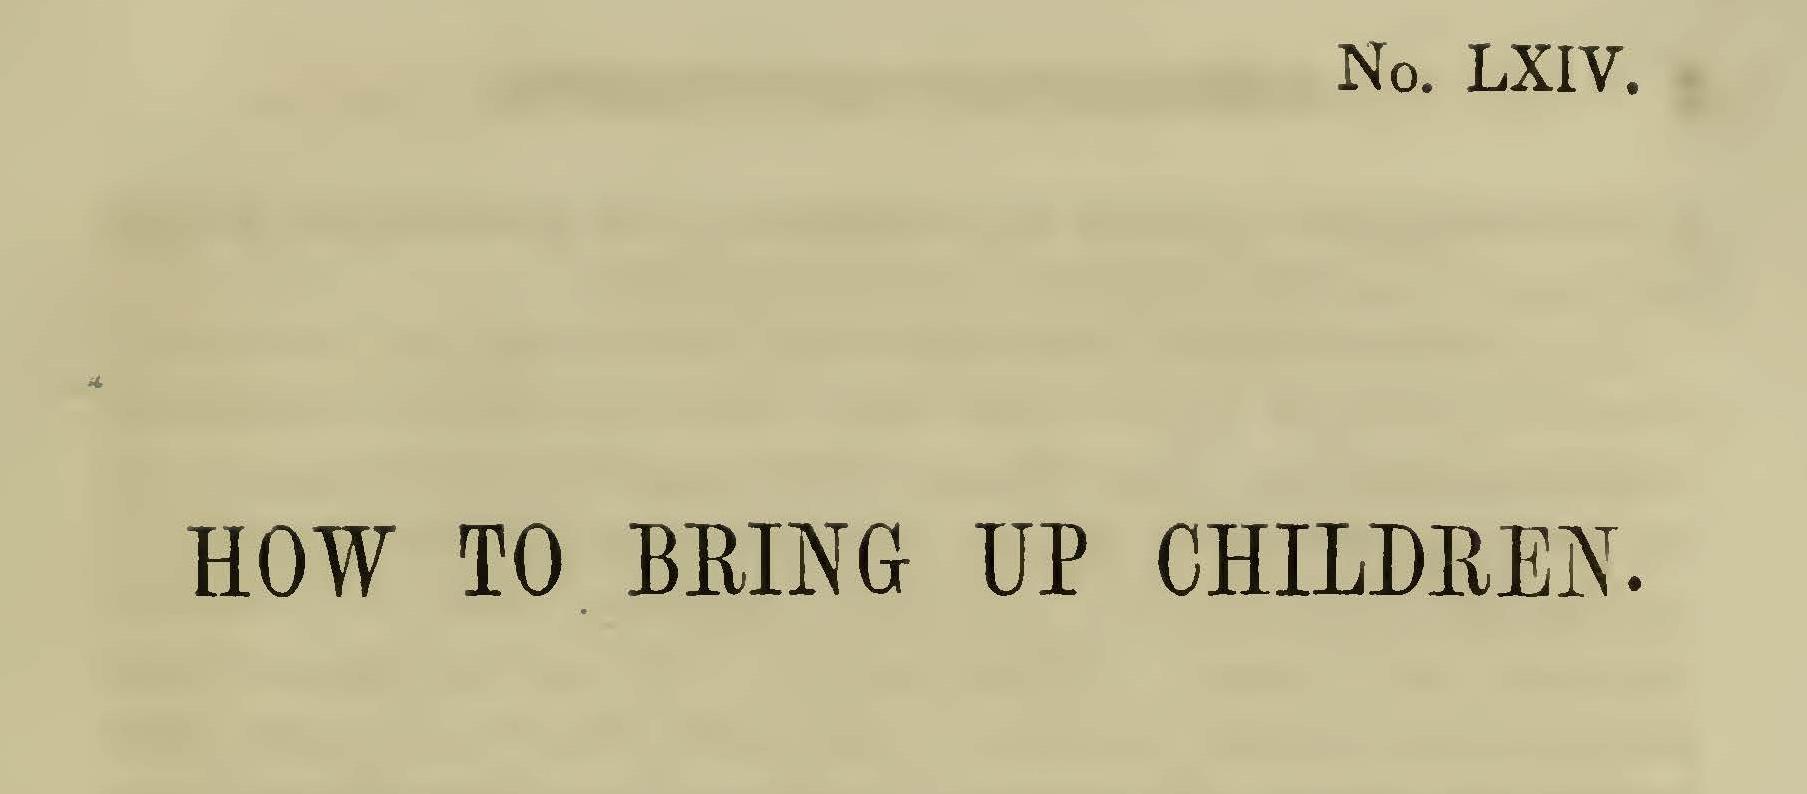 Plumer, William Swan, How to Bring Up Children Title Page.jpg